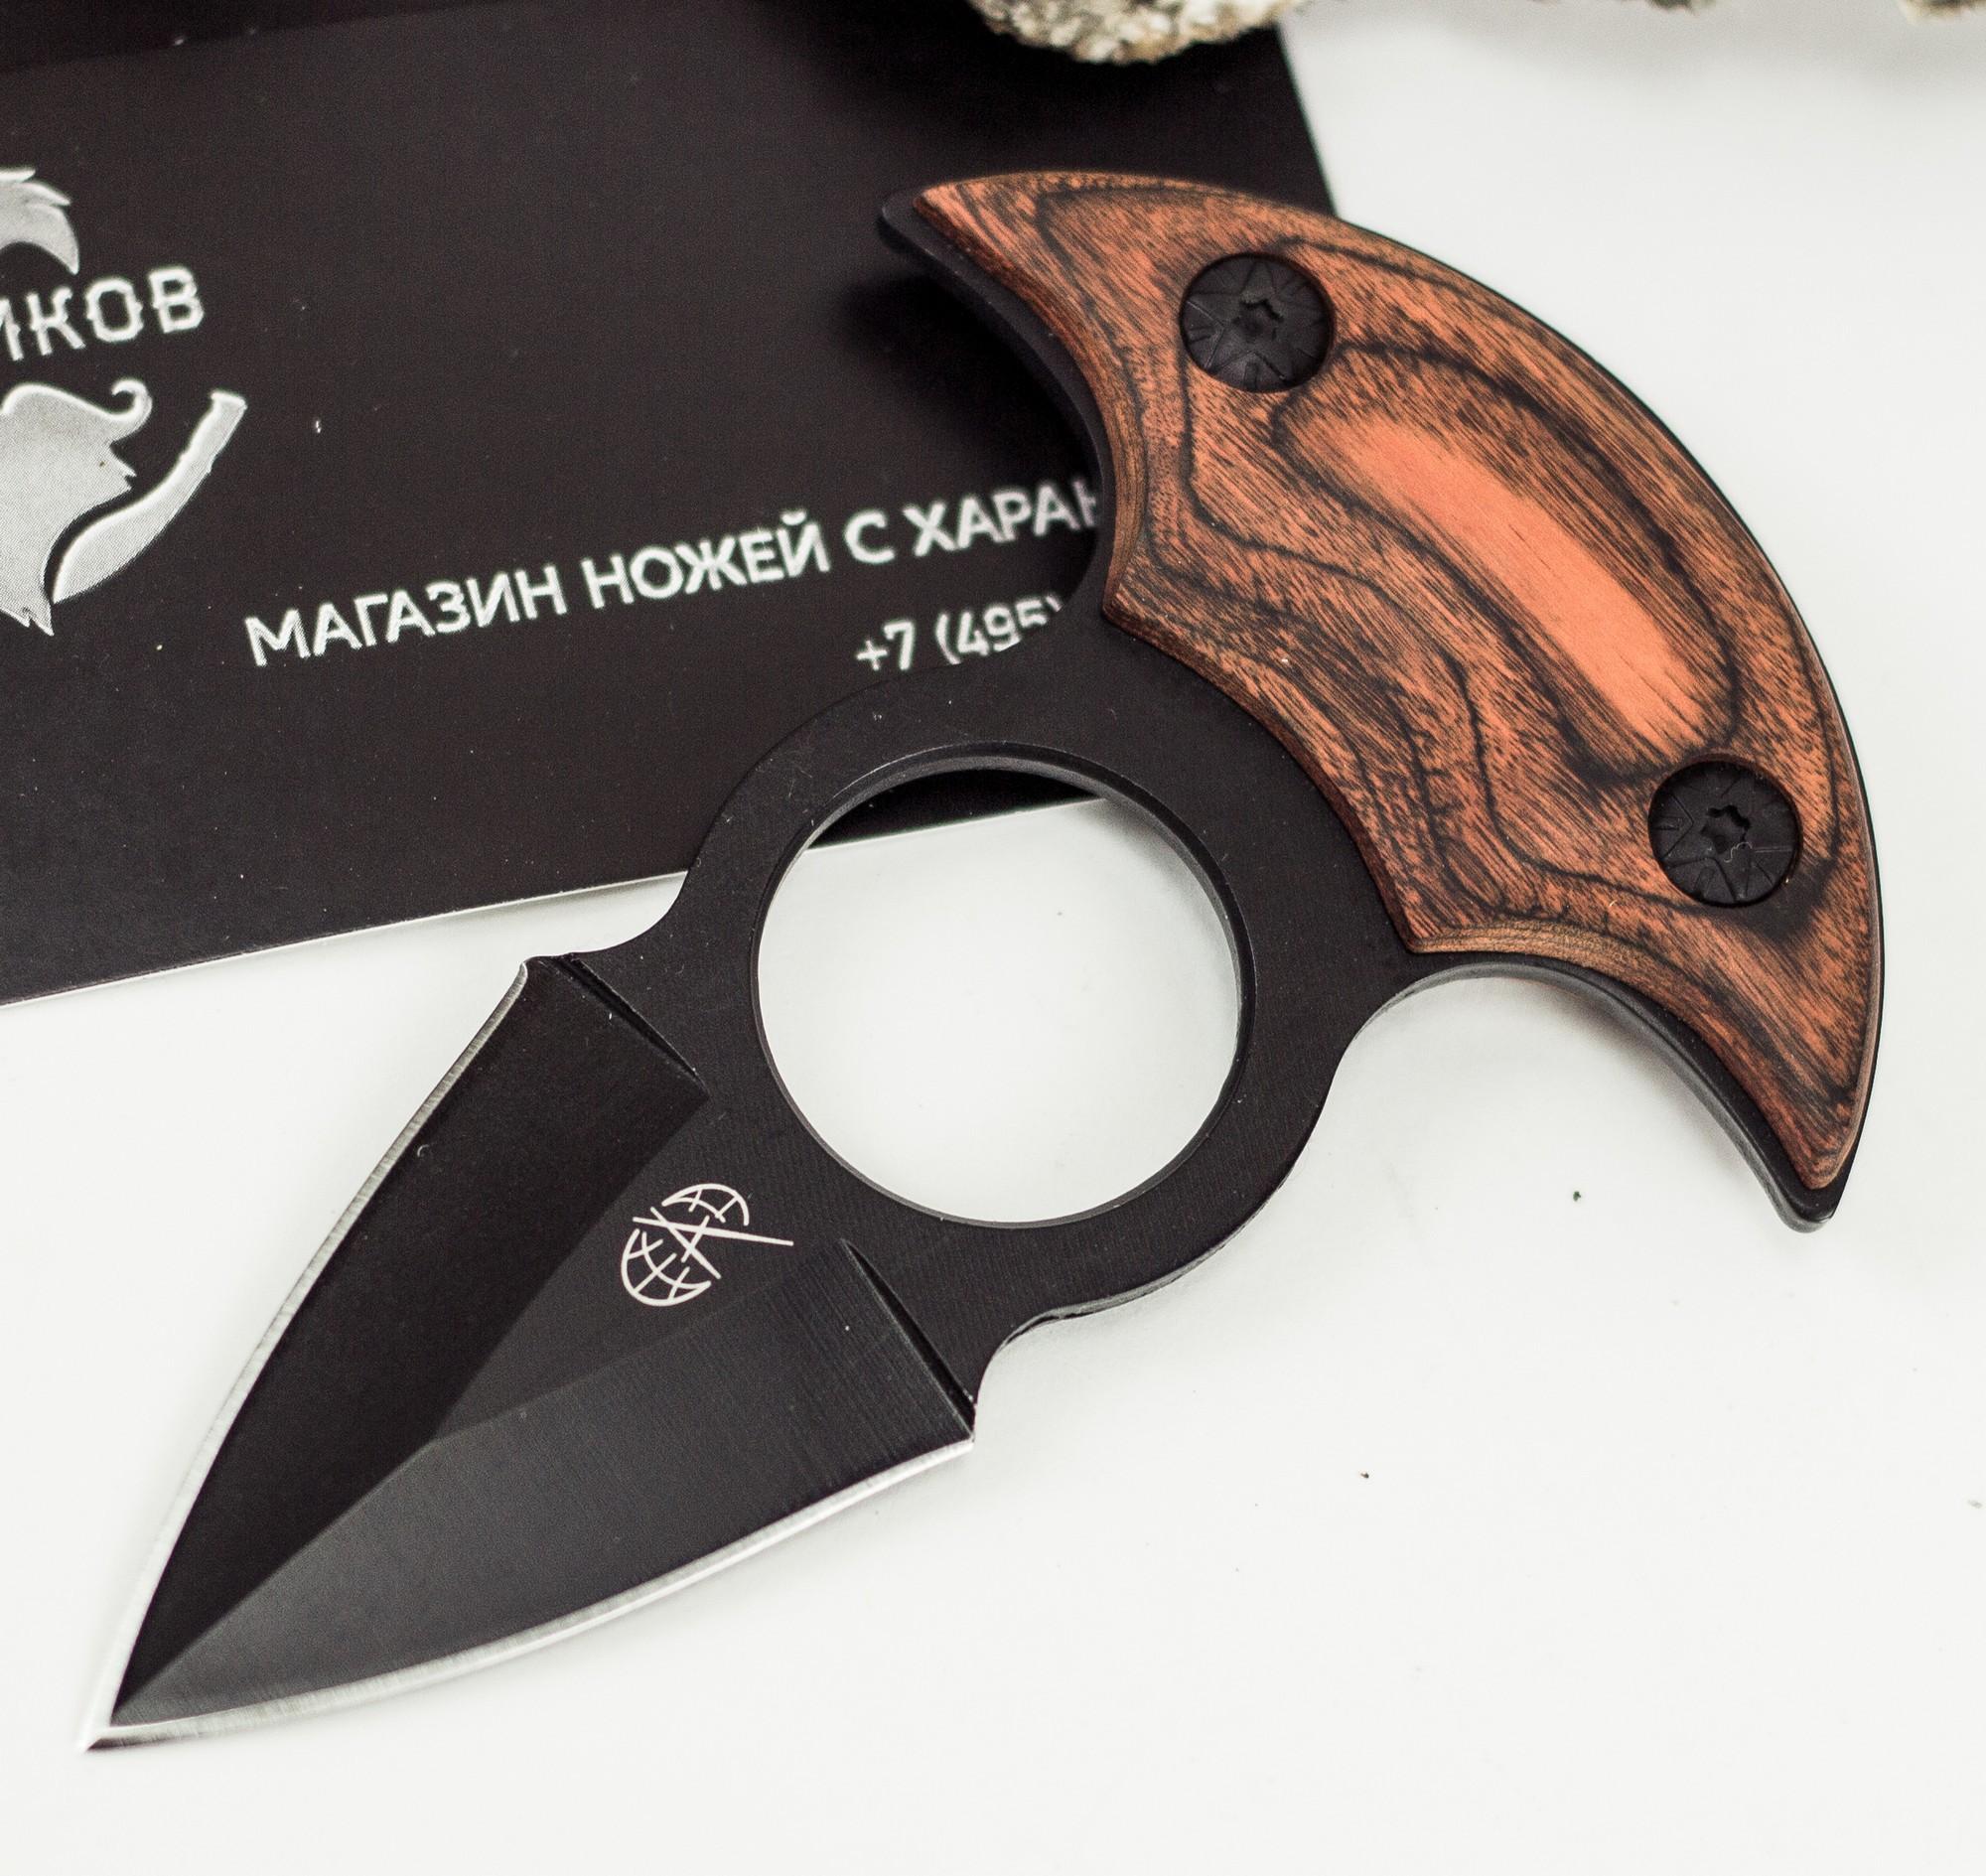 Тычковый нож 1202B40х13<br>Тычковый нож 1202B<br>